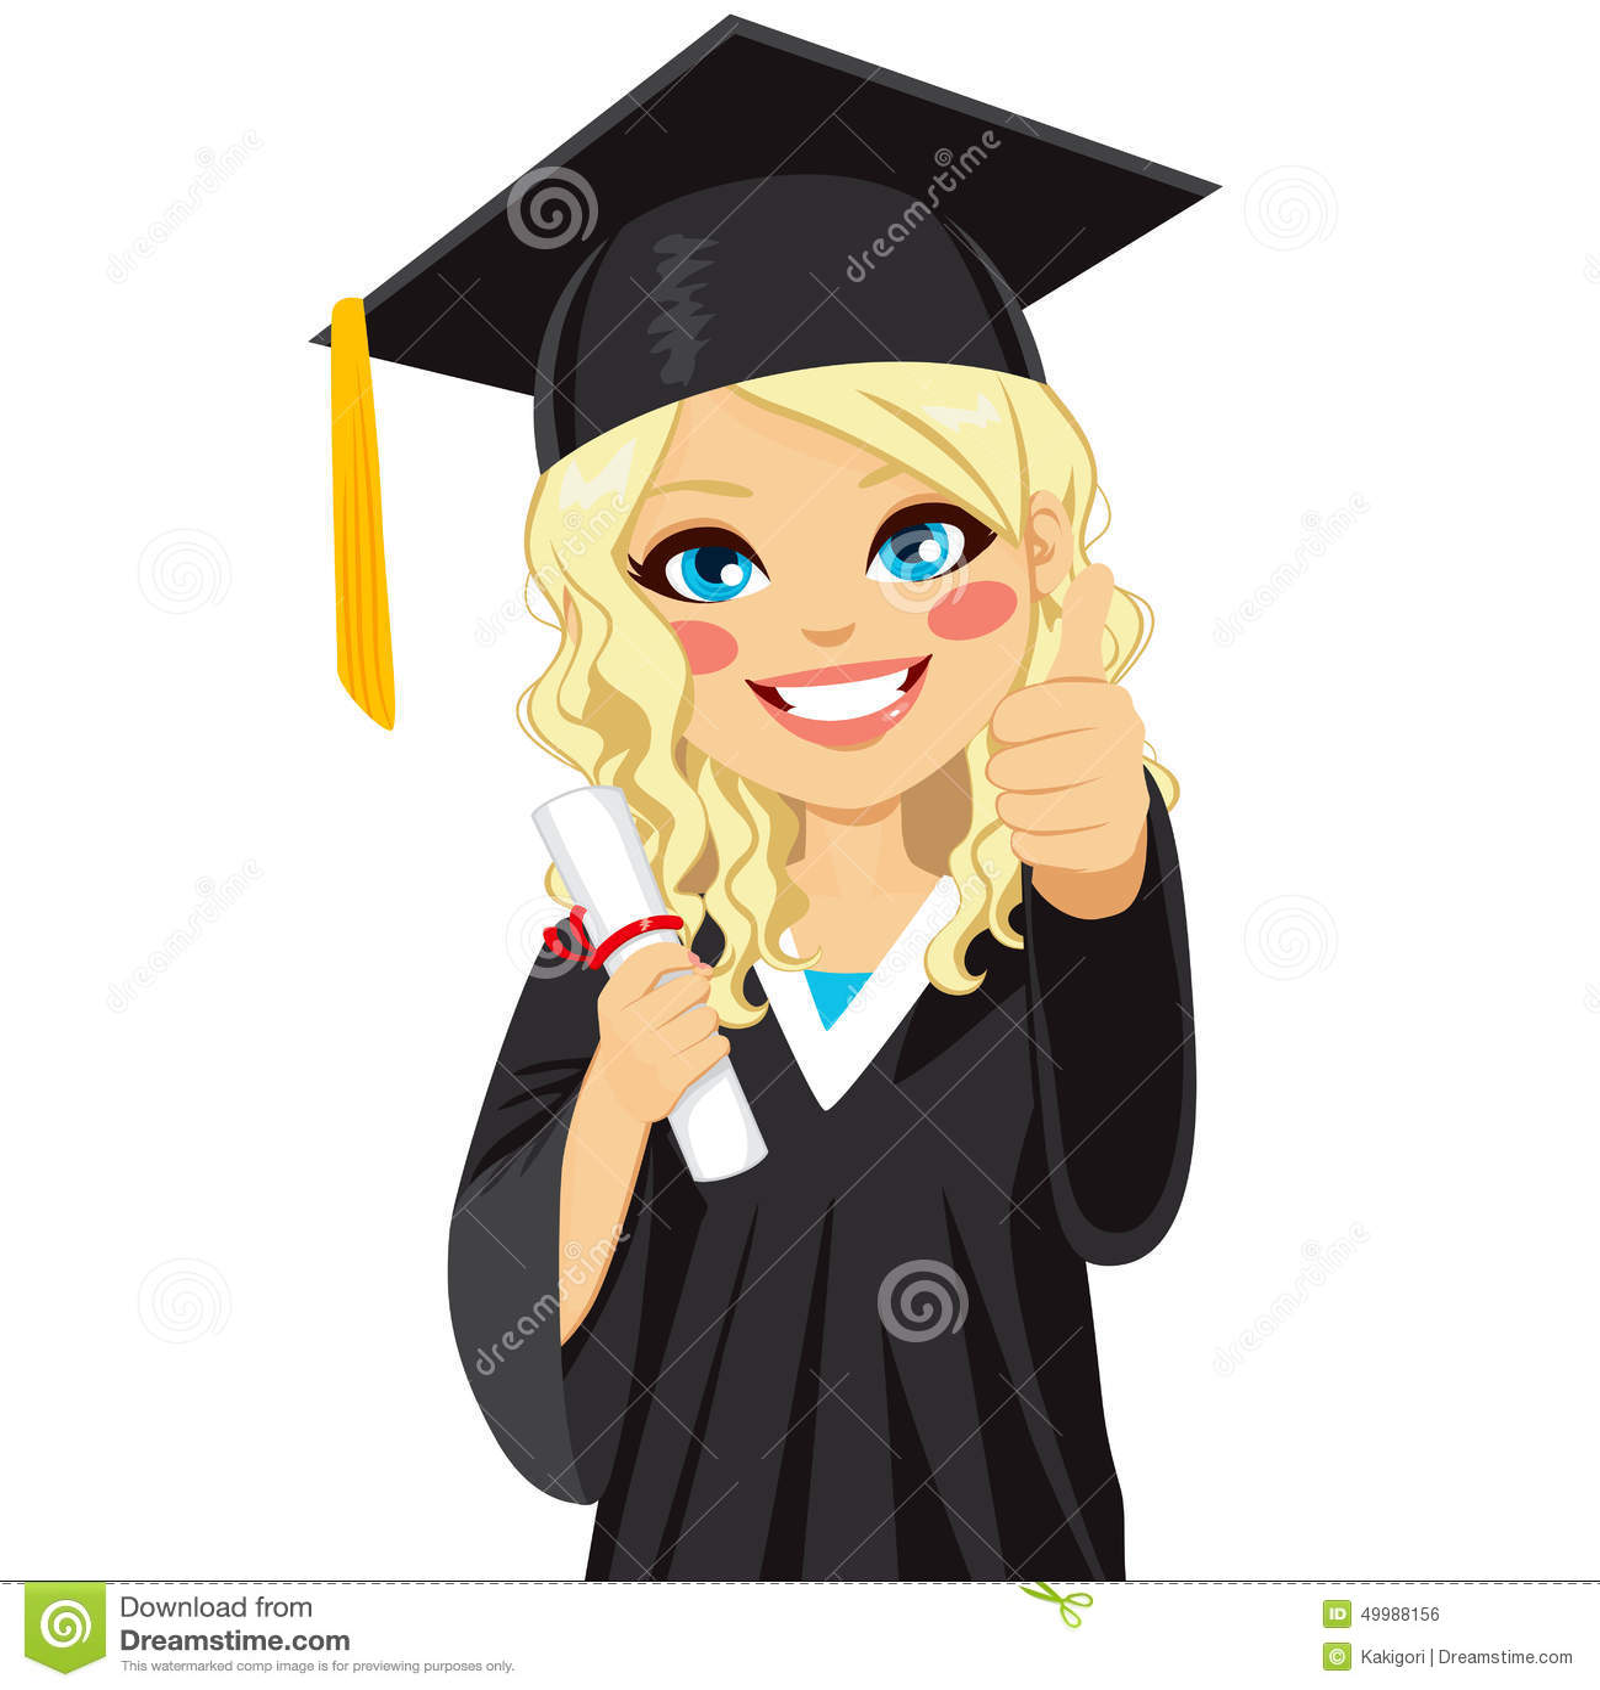 How to dress up a graduation girl in kindergarten 40